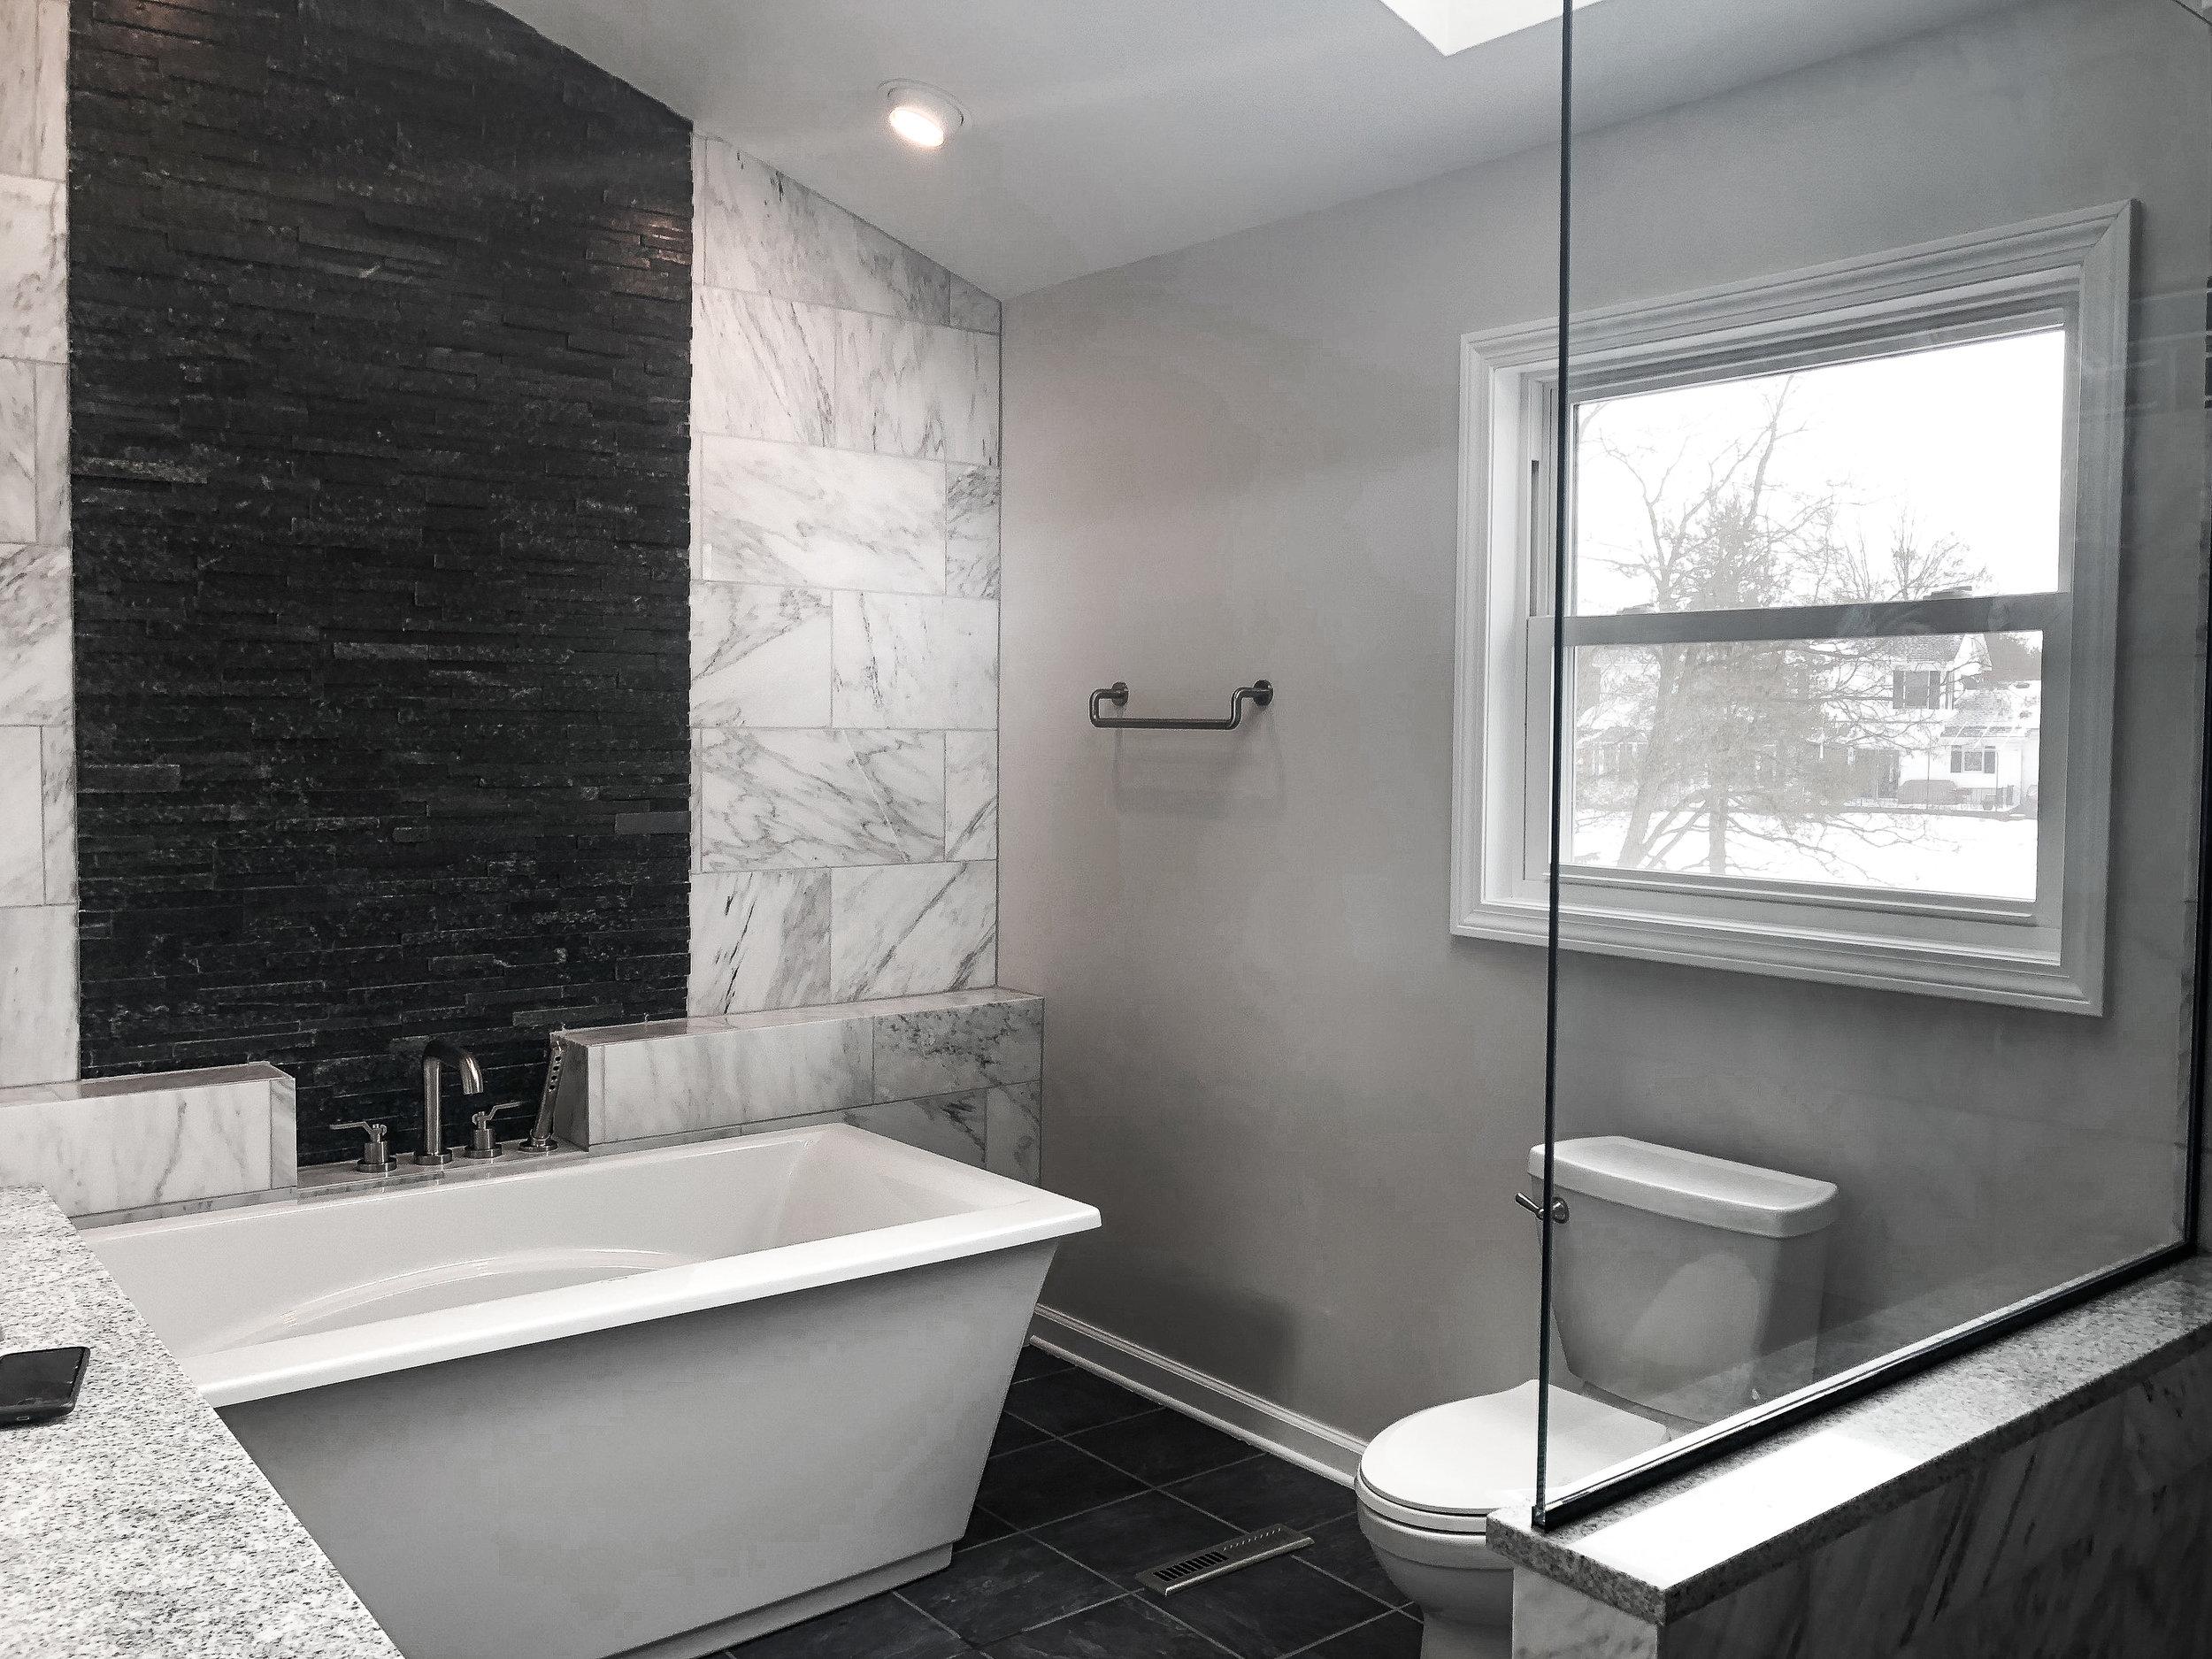 Bathroom Remodel in Buffalo NY